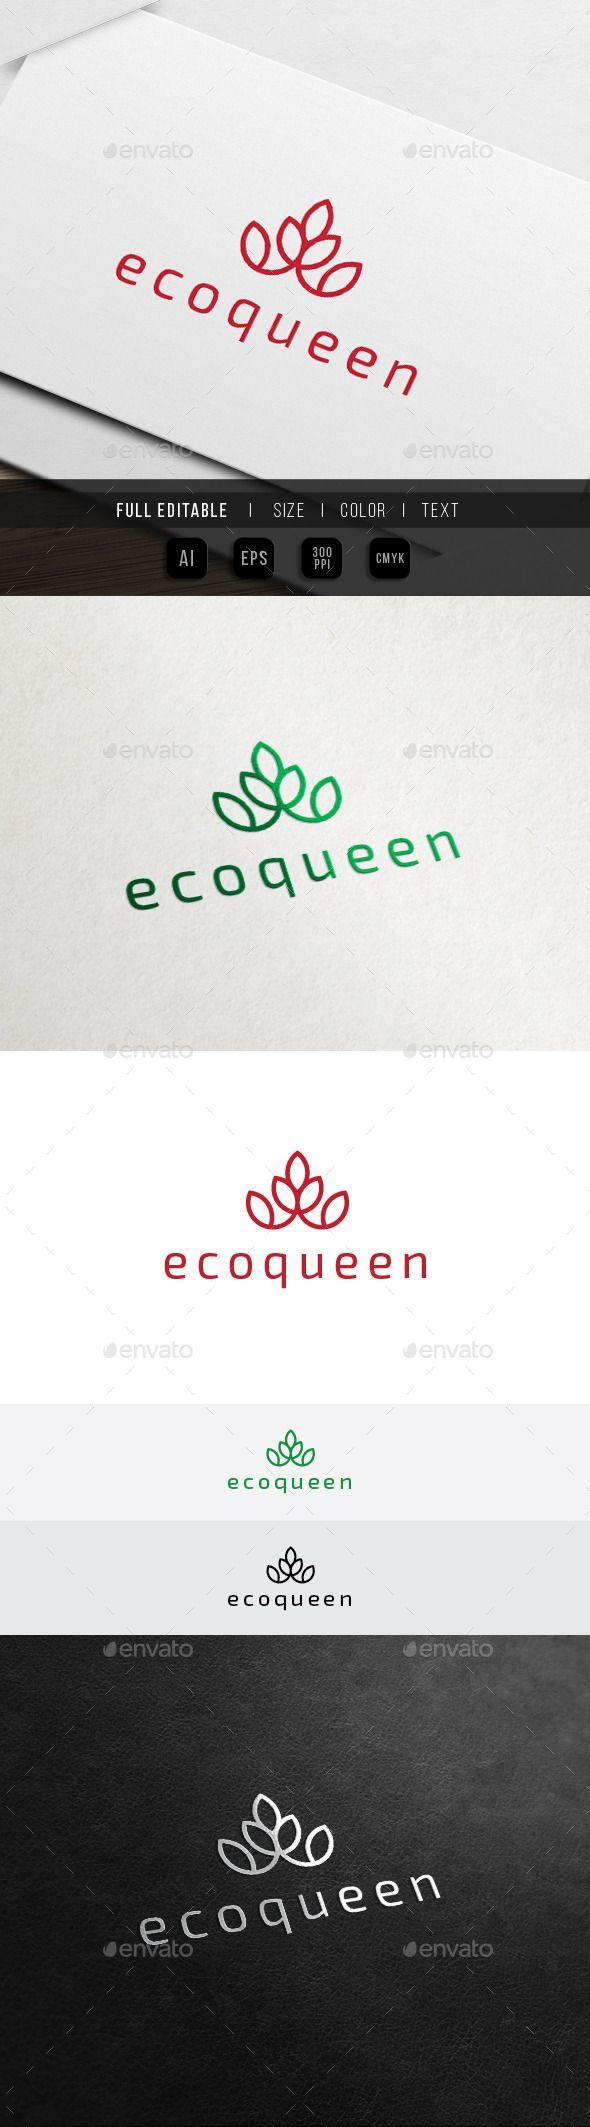 Eco Crown Hotel - Green Spa Resort Logo - Nature Logo Templates